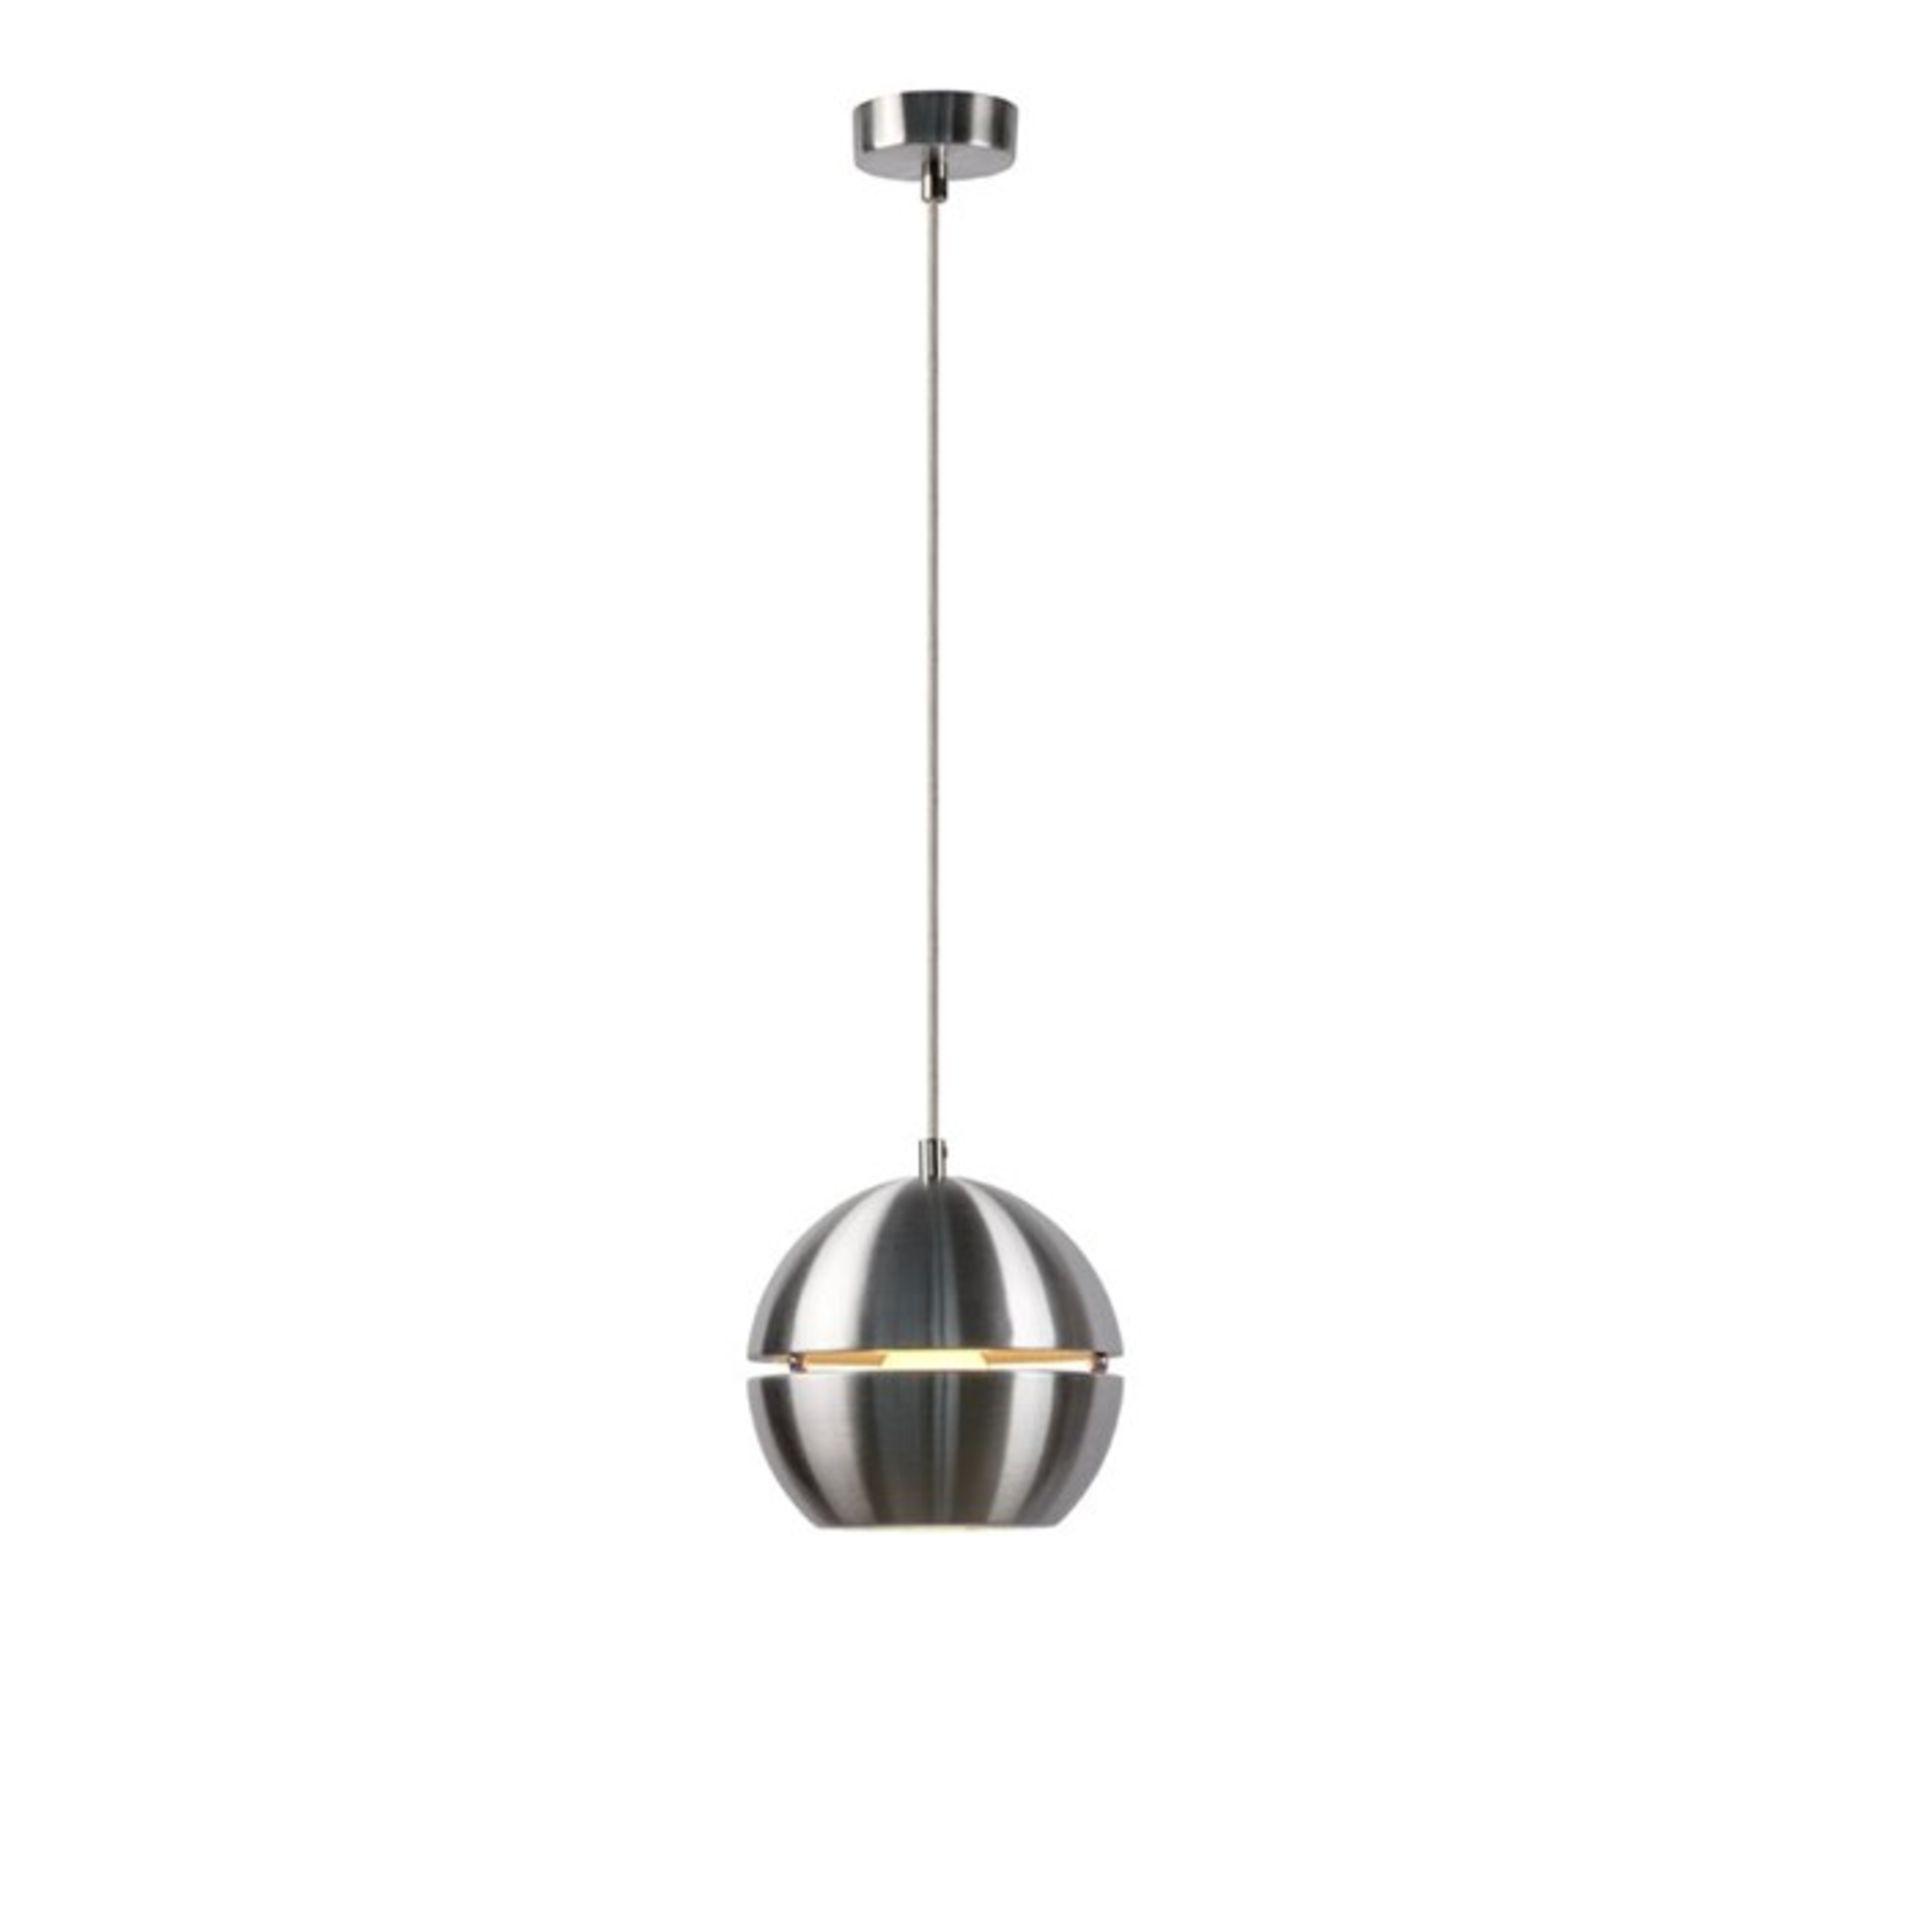 Lucide, Volo 1-Light Sphere Pendant - RRP £31.99 (LCDE1950 - 13943/4) 7E